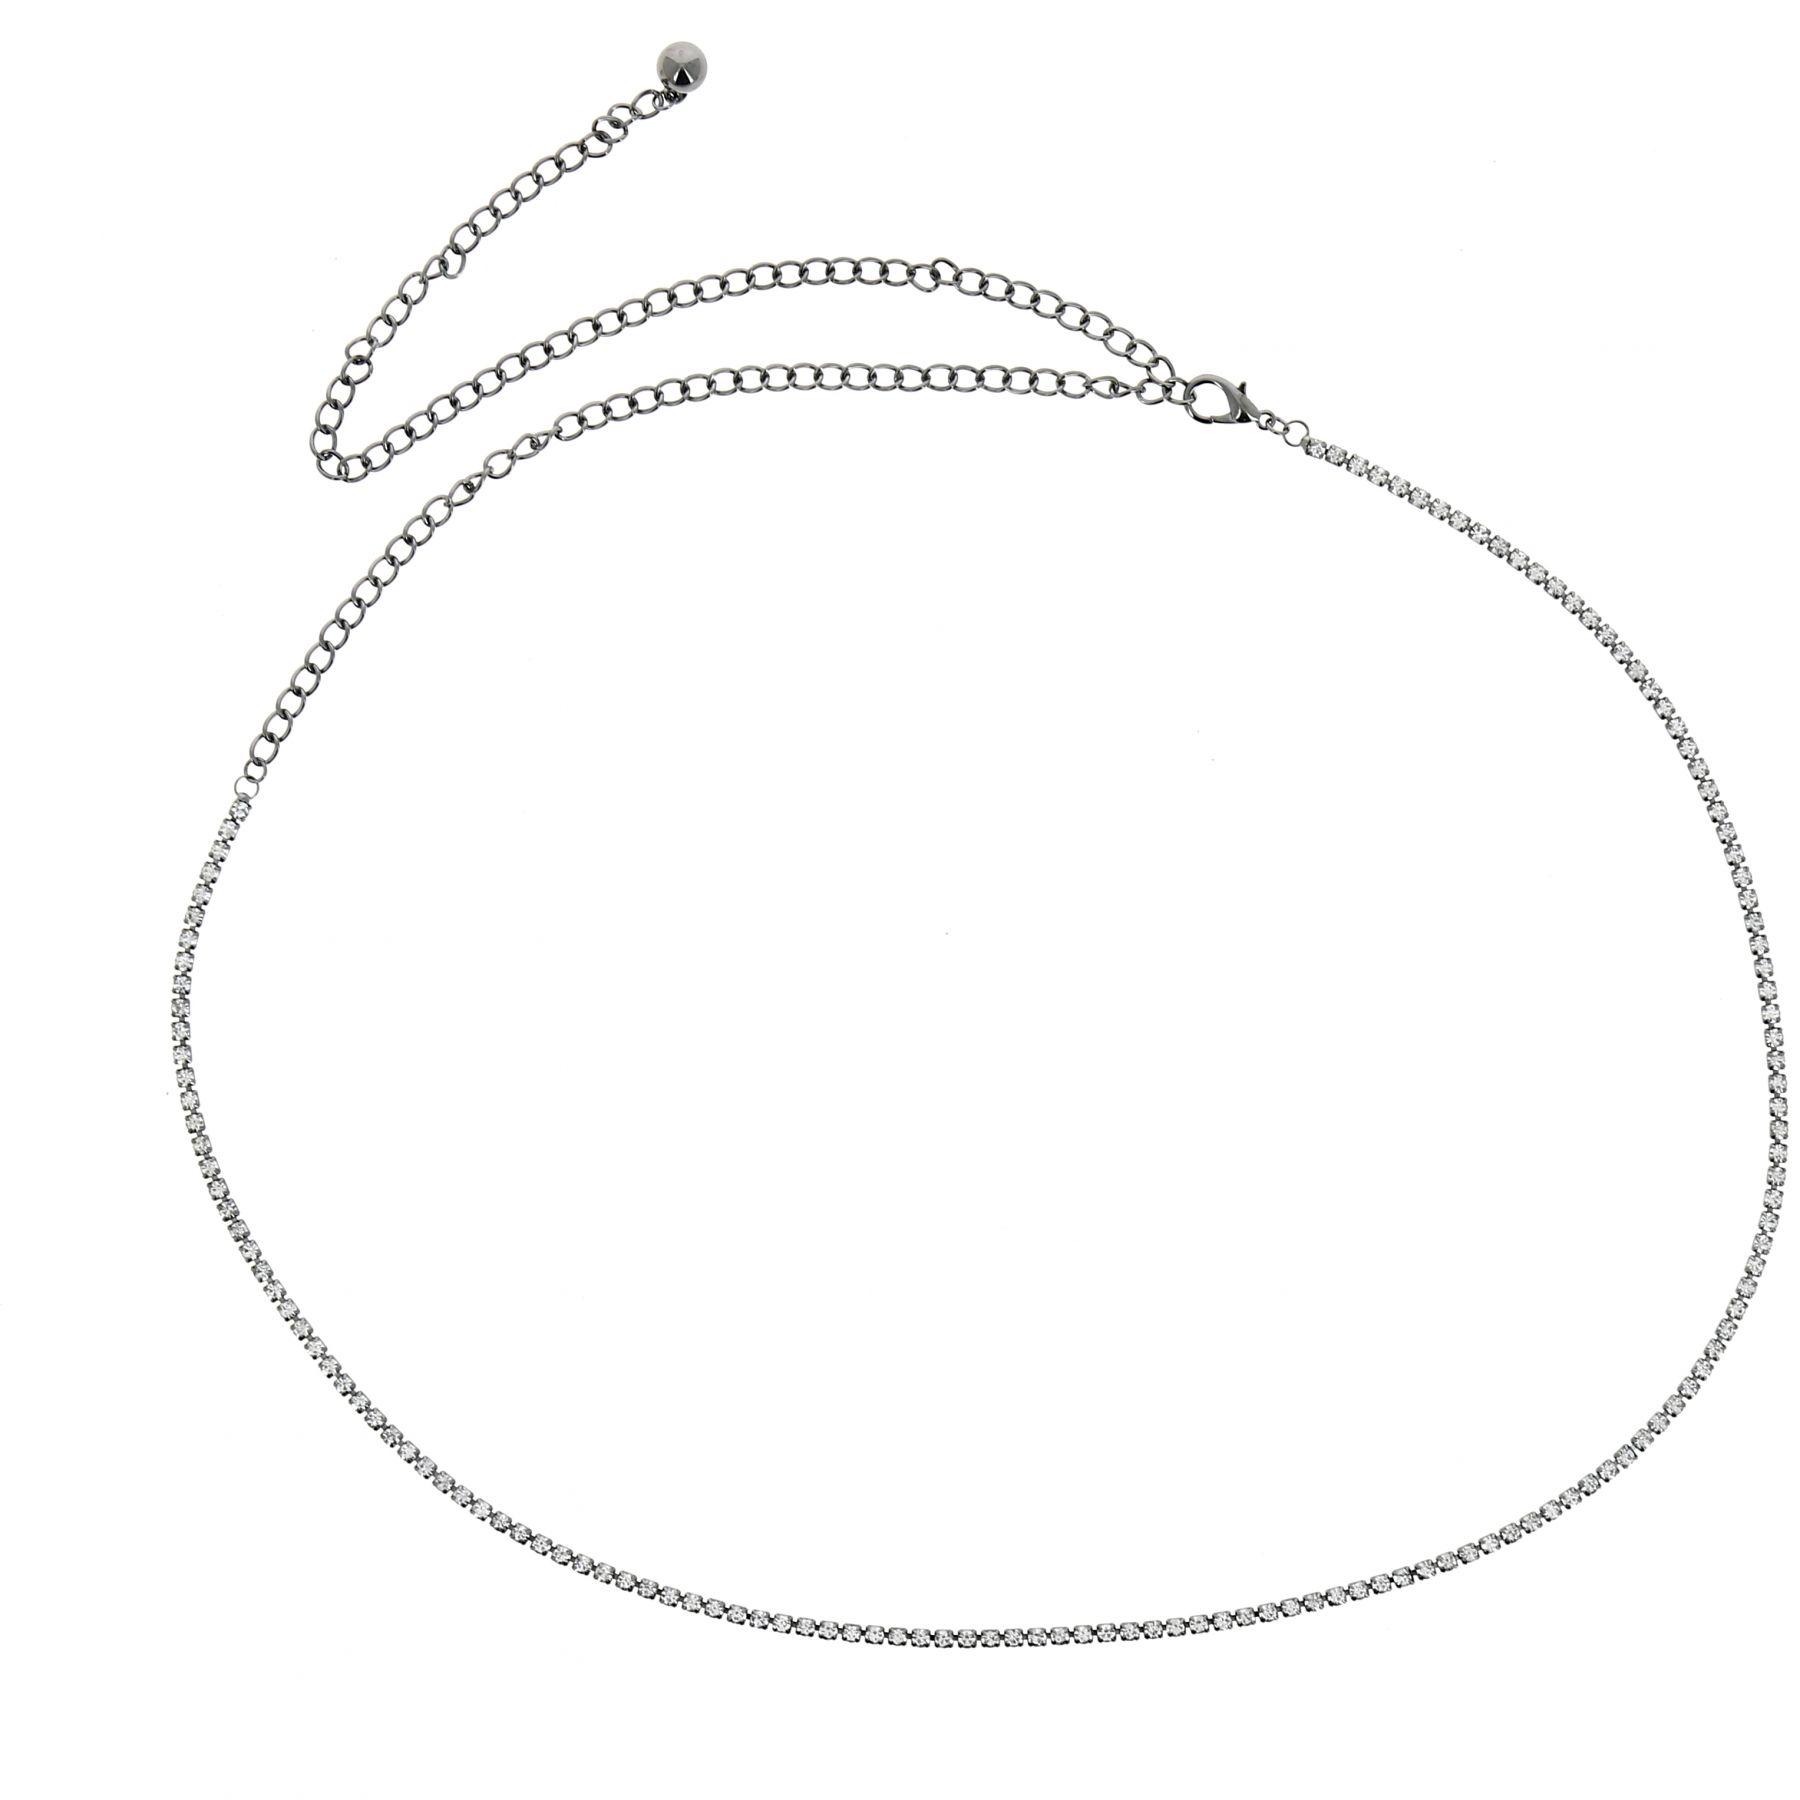 Metallico Catena Cintura da Donna SYLVIE Fashiongen